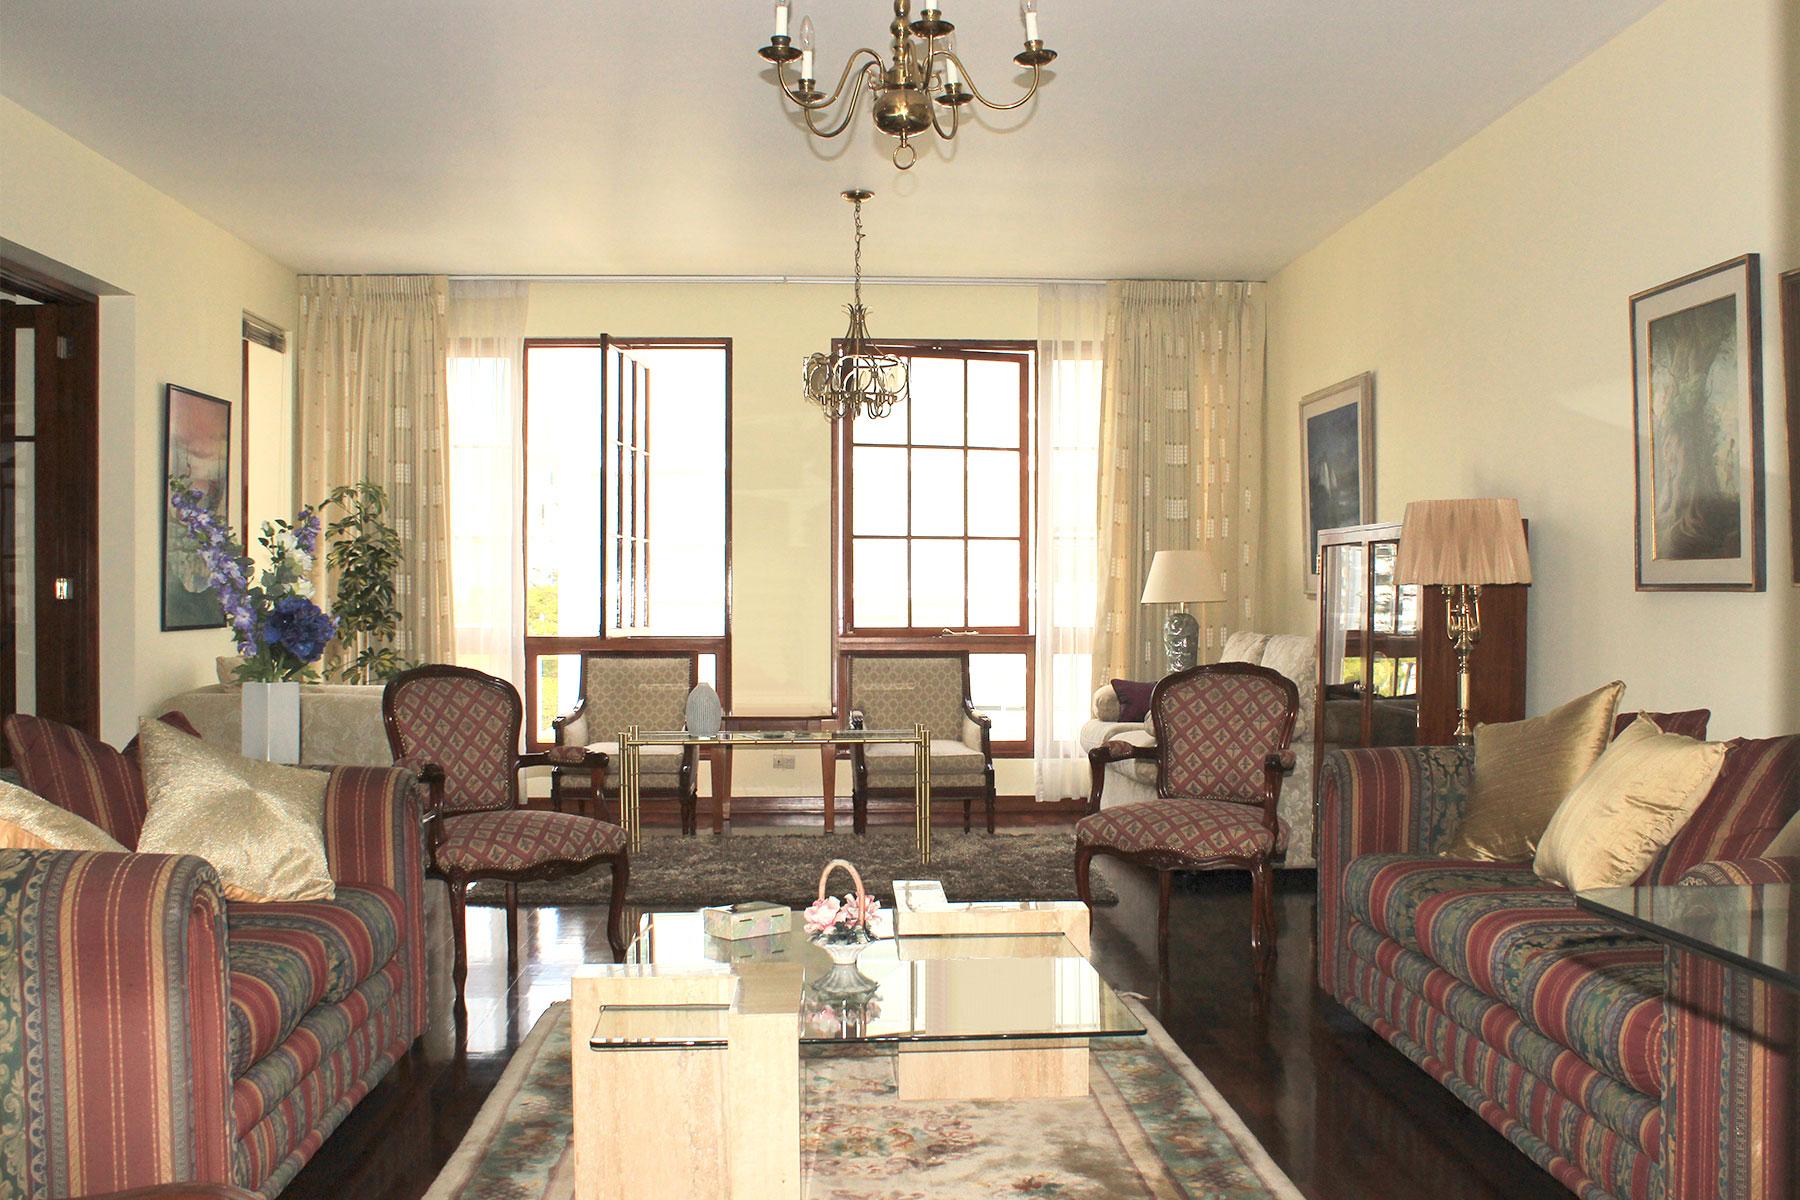 Appartamento per Affitto alle ore Departamento finamente amoblado en zona exclusiva de San Isidro Av. Jorge Basadre San Isidro, Lima, 27 Peru